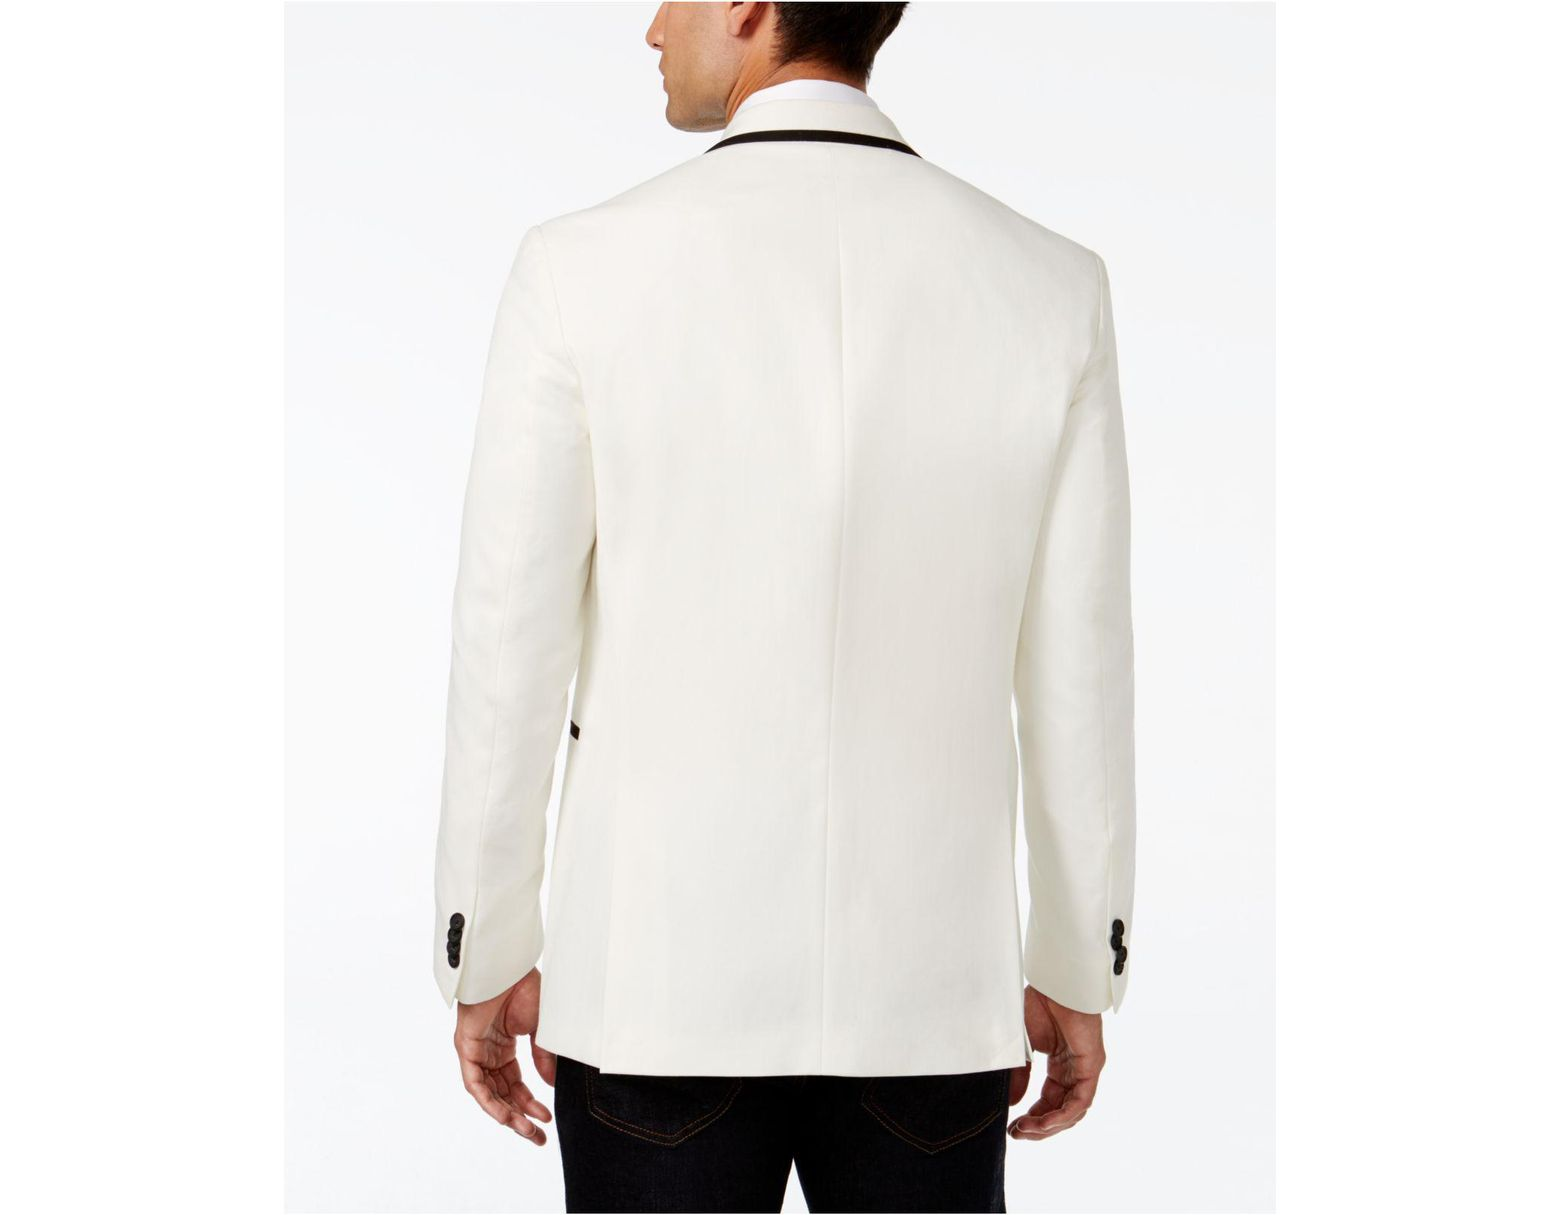 7b7ecfcbc Men's White Slim Fit Evening Blazer